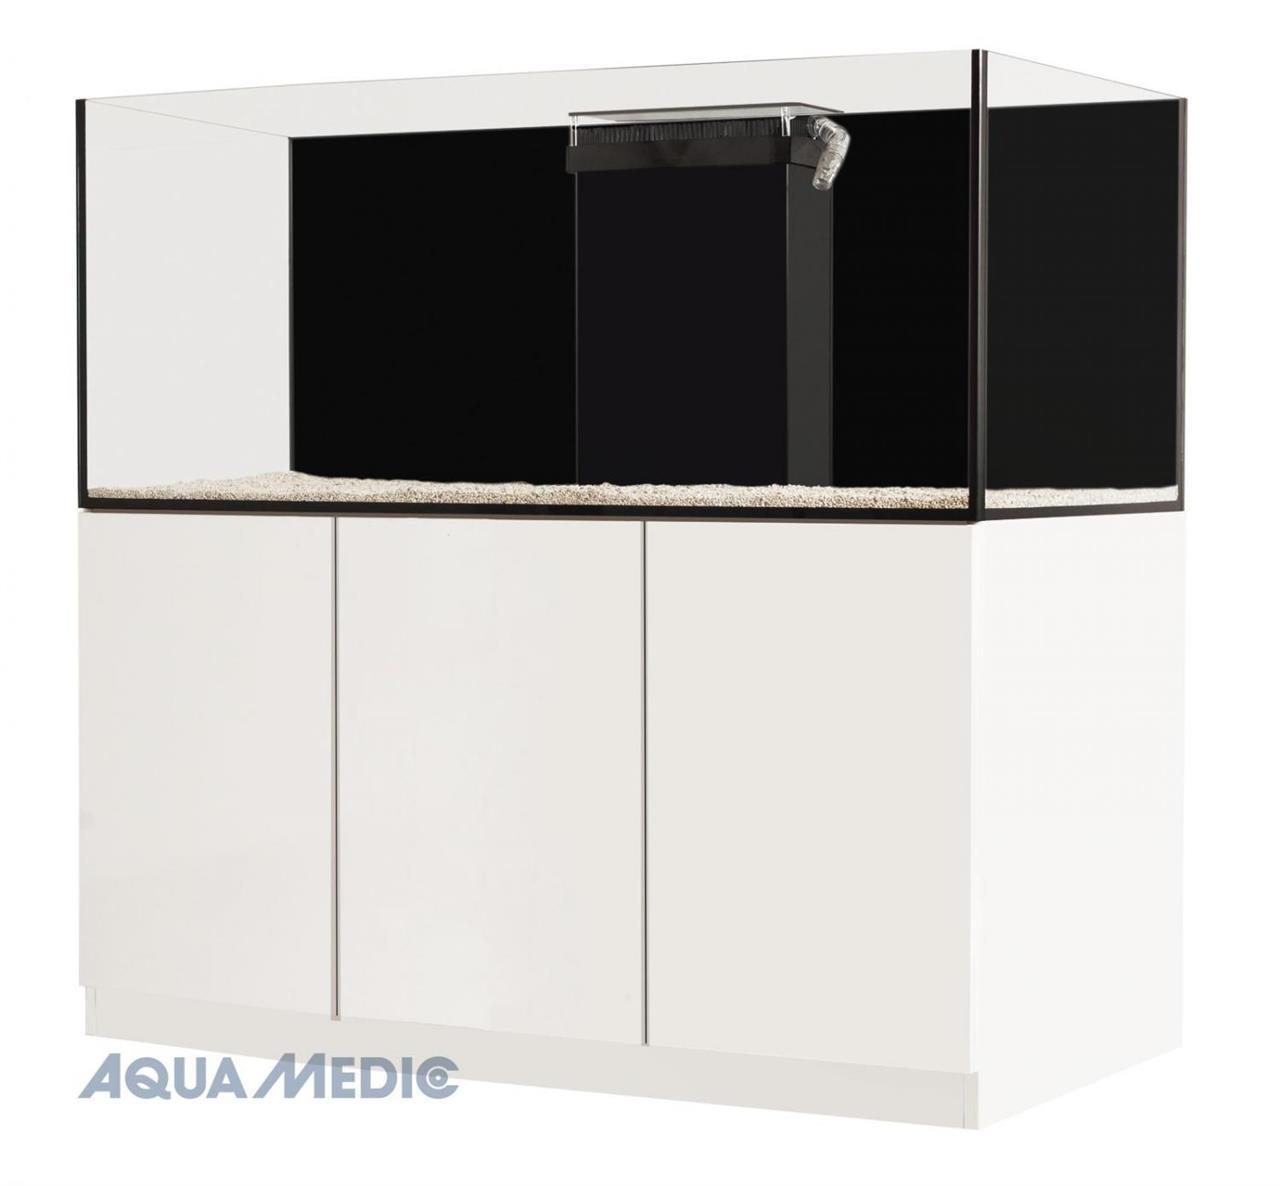 AquaMedic Xenia 160 svart